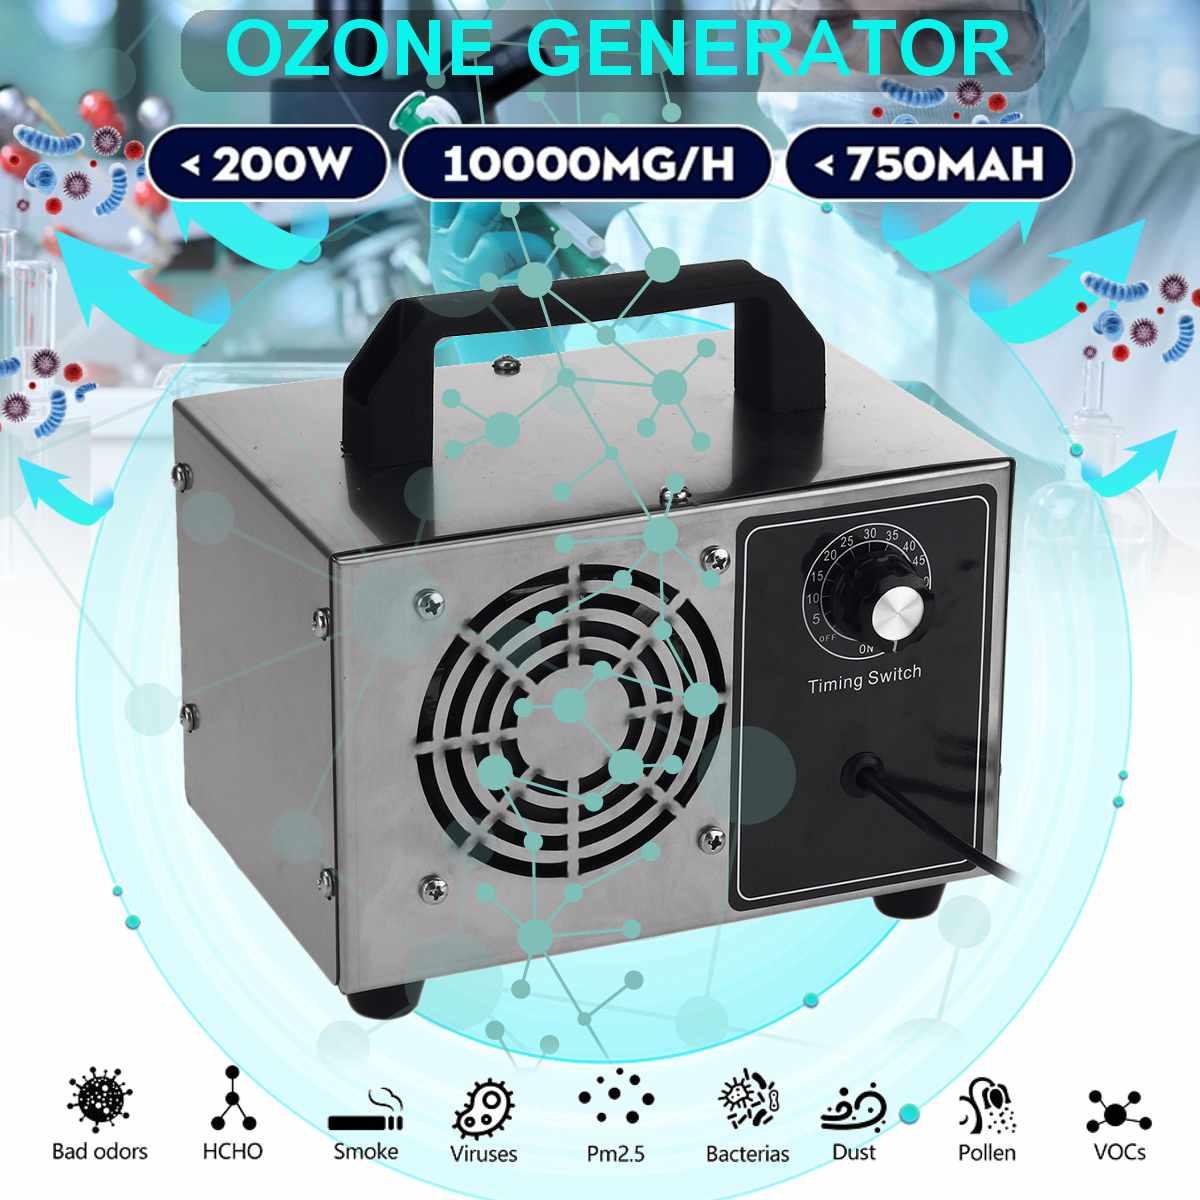 220/110V 24 g/h 20 g/h 10 g/h 5 g/h O3 generador de ozono ozonizador purificador de aire limpiador de aire desinfectante + interruptor de sincronización